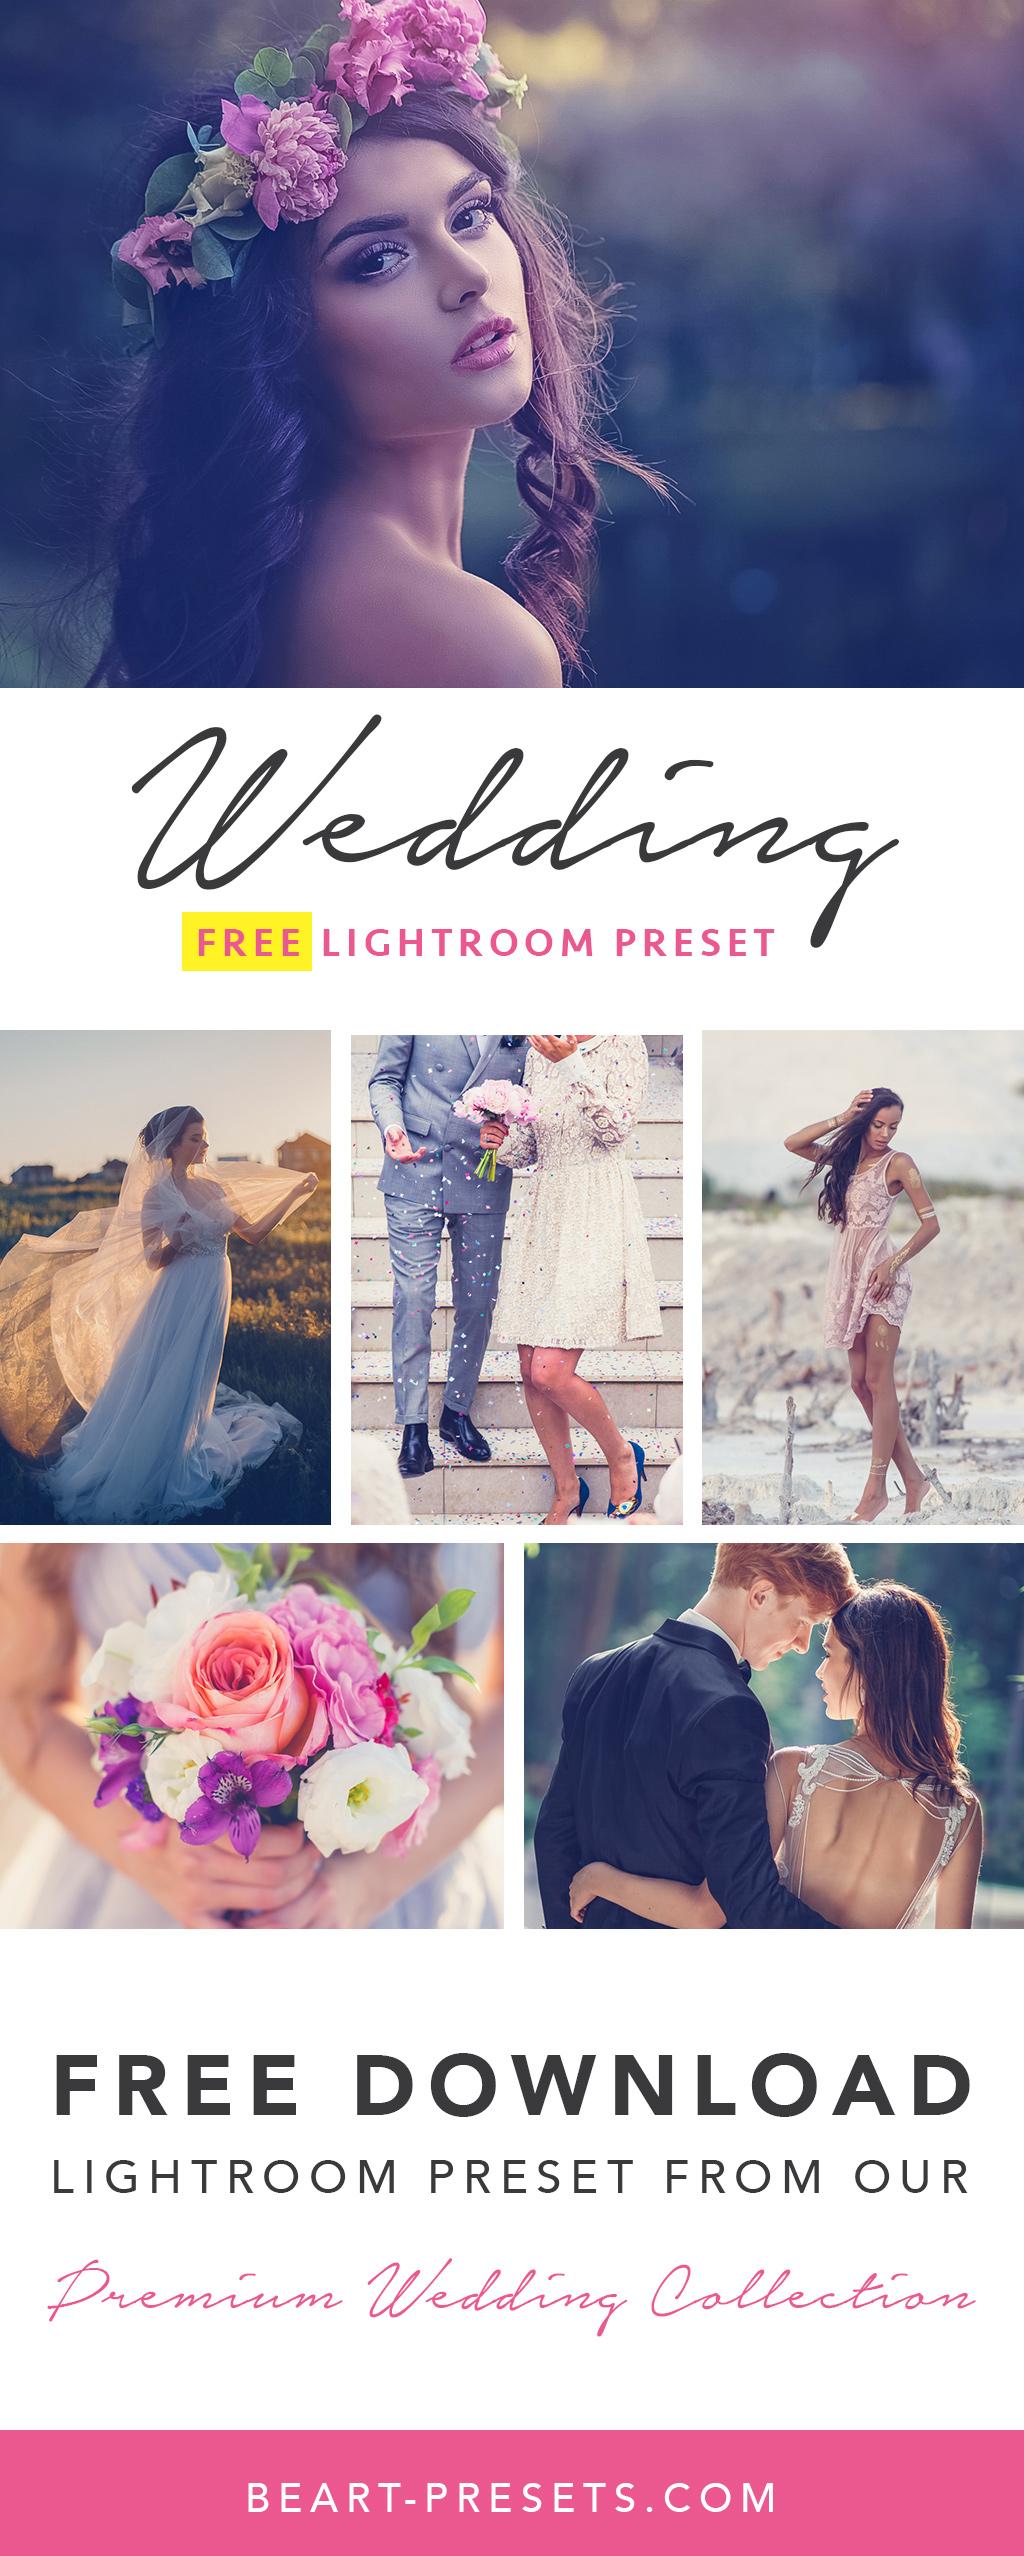 free-wedding-lightroom-preset